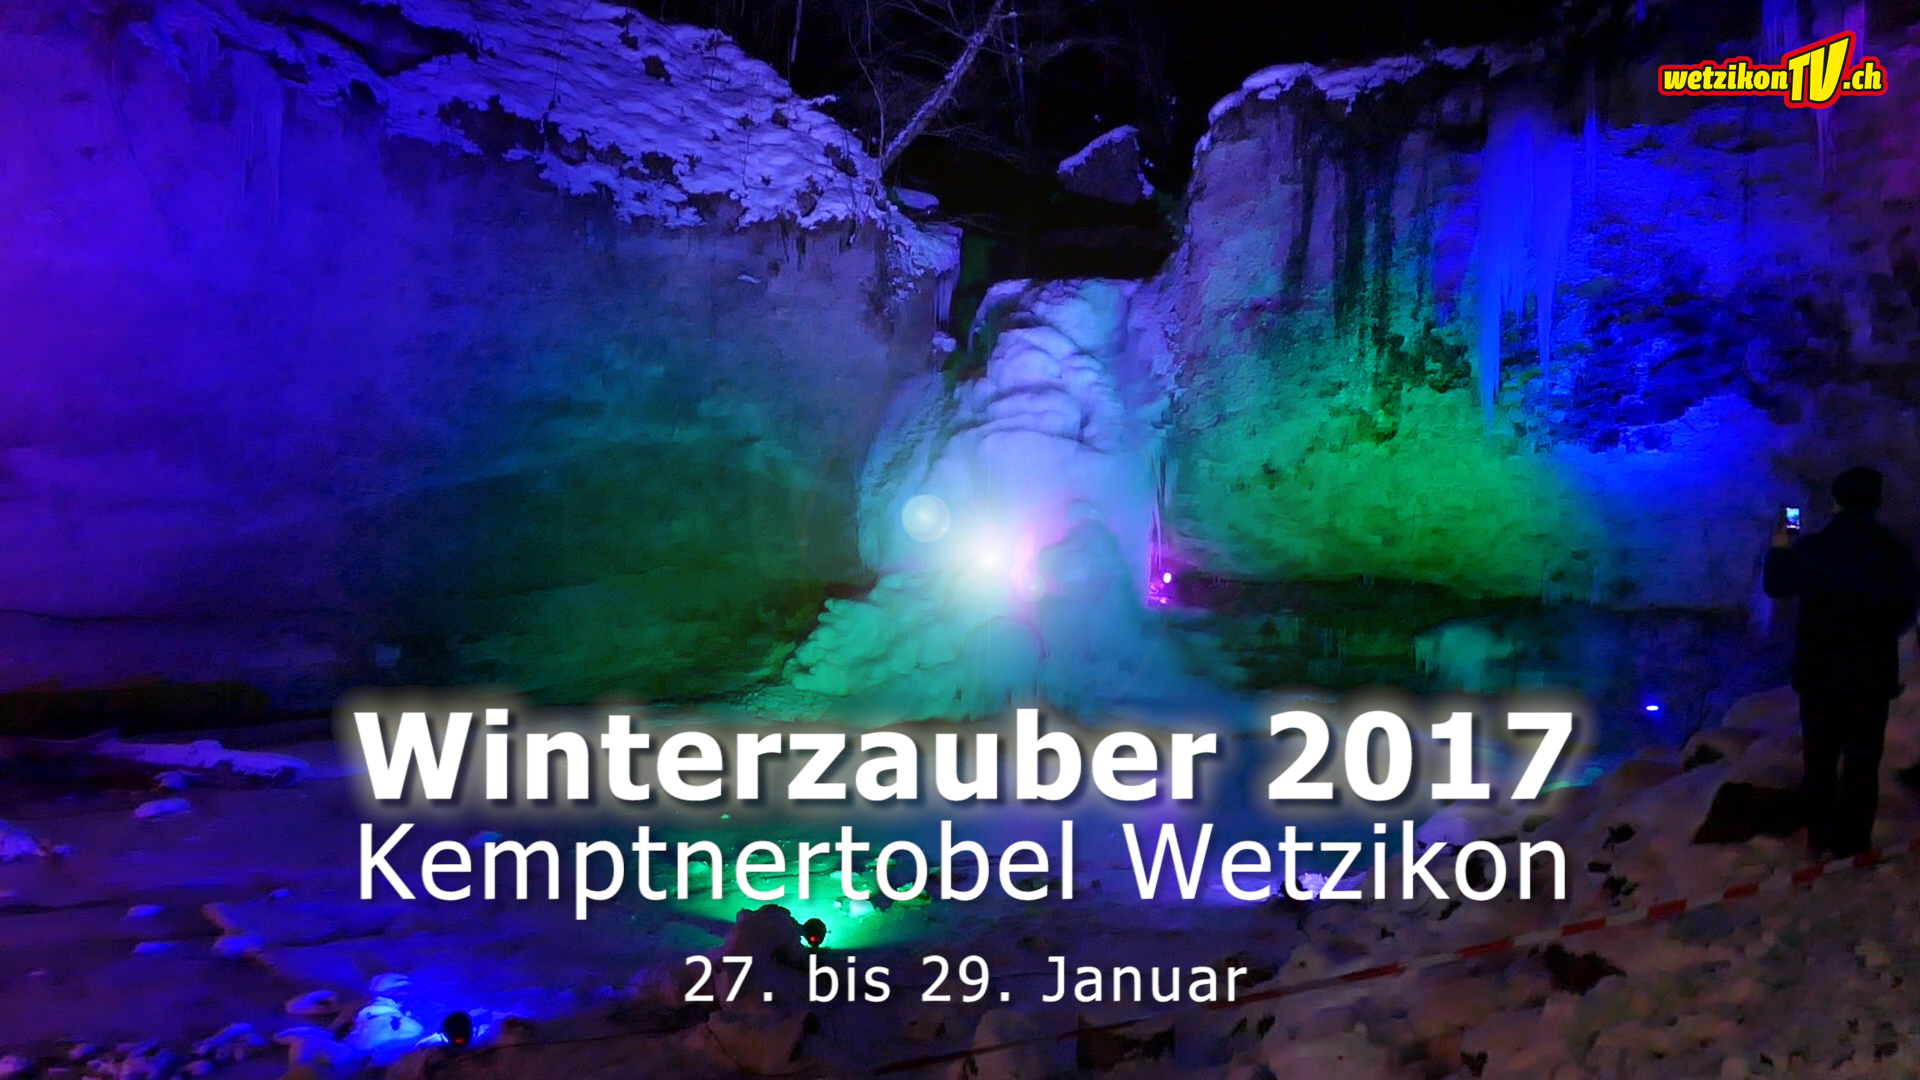 <a href=&quot;http://www.winterzauber-wetzikon.ch&quot; target=&quot;_blank&quot;>www.winterzauber-wetzikon.ch</a>